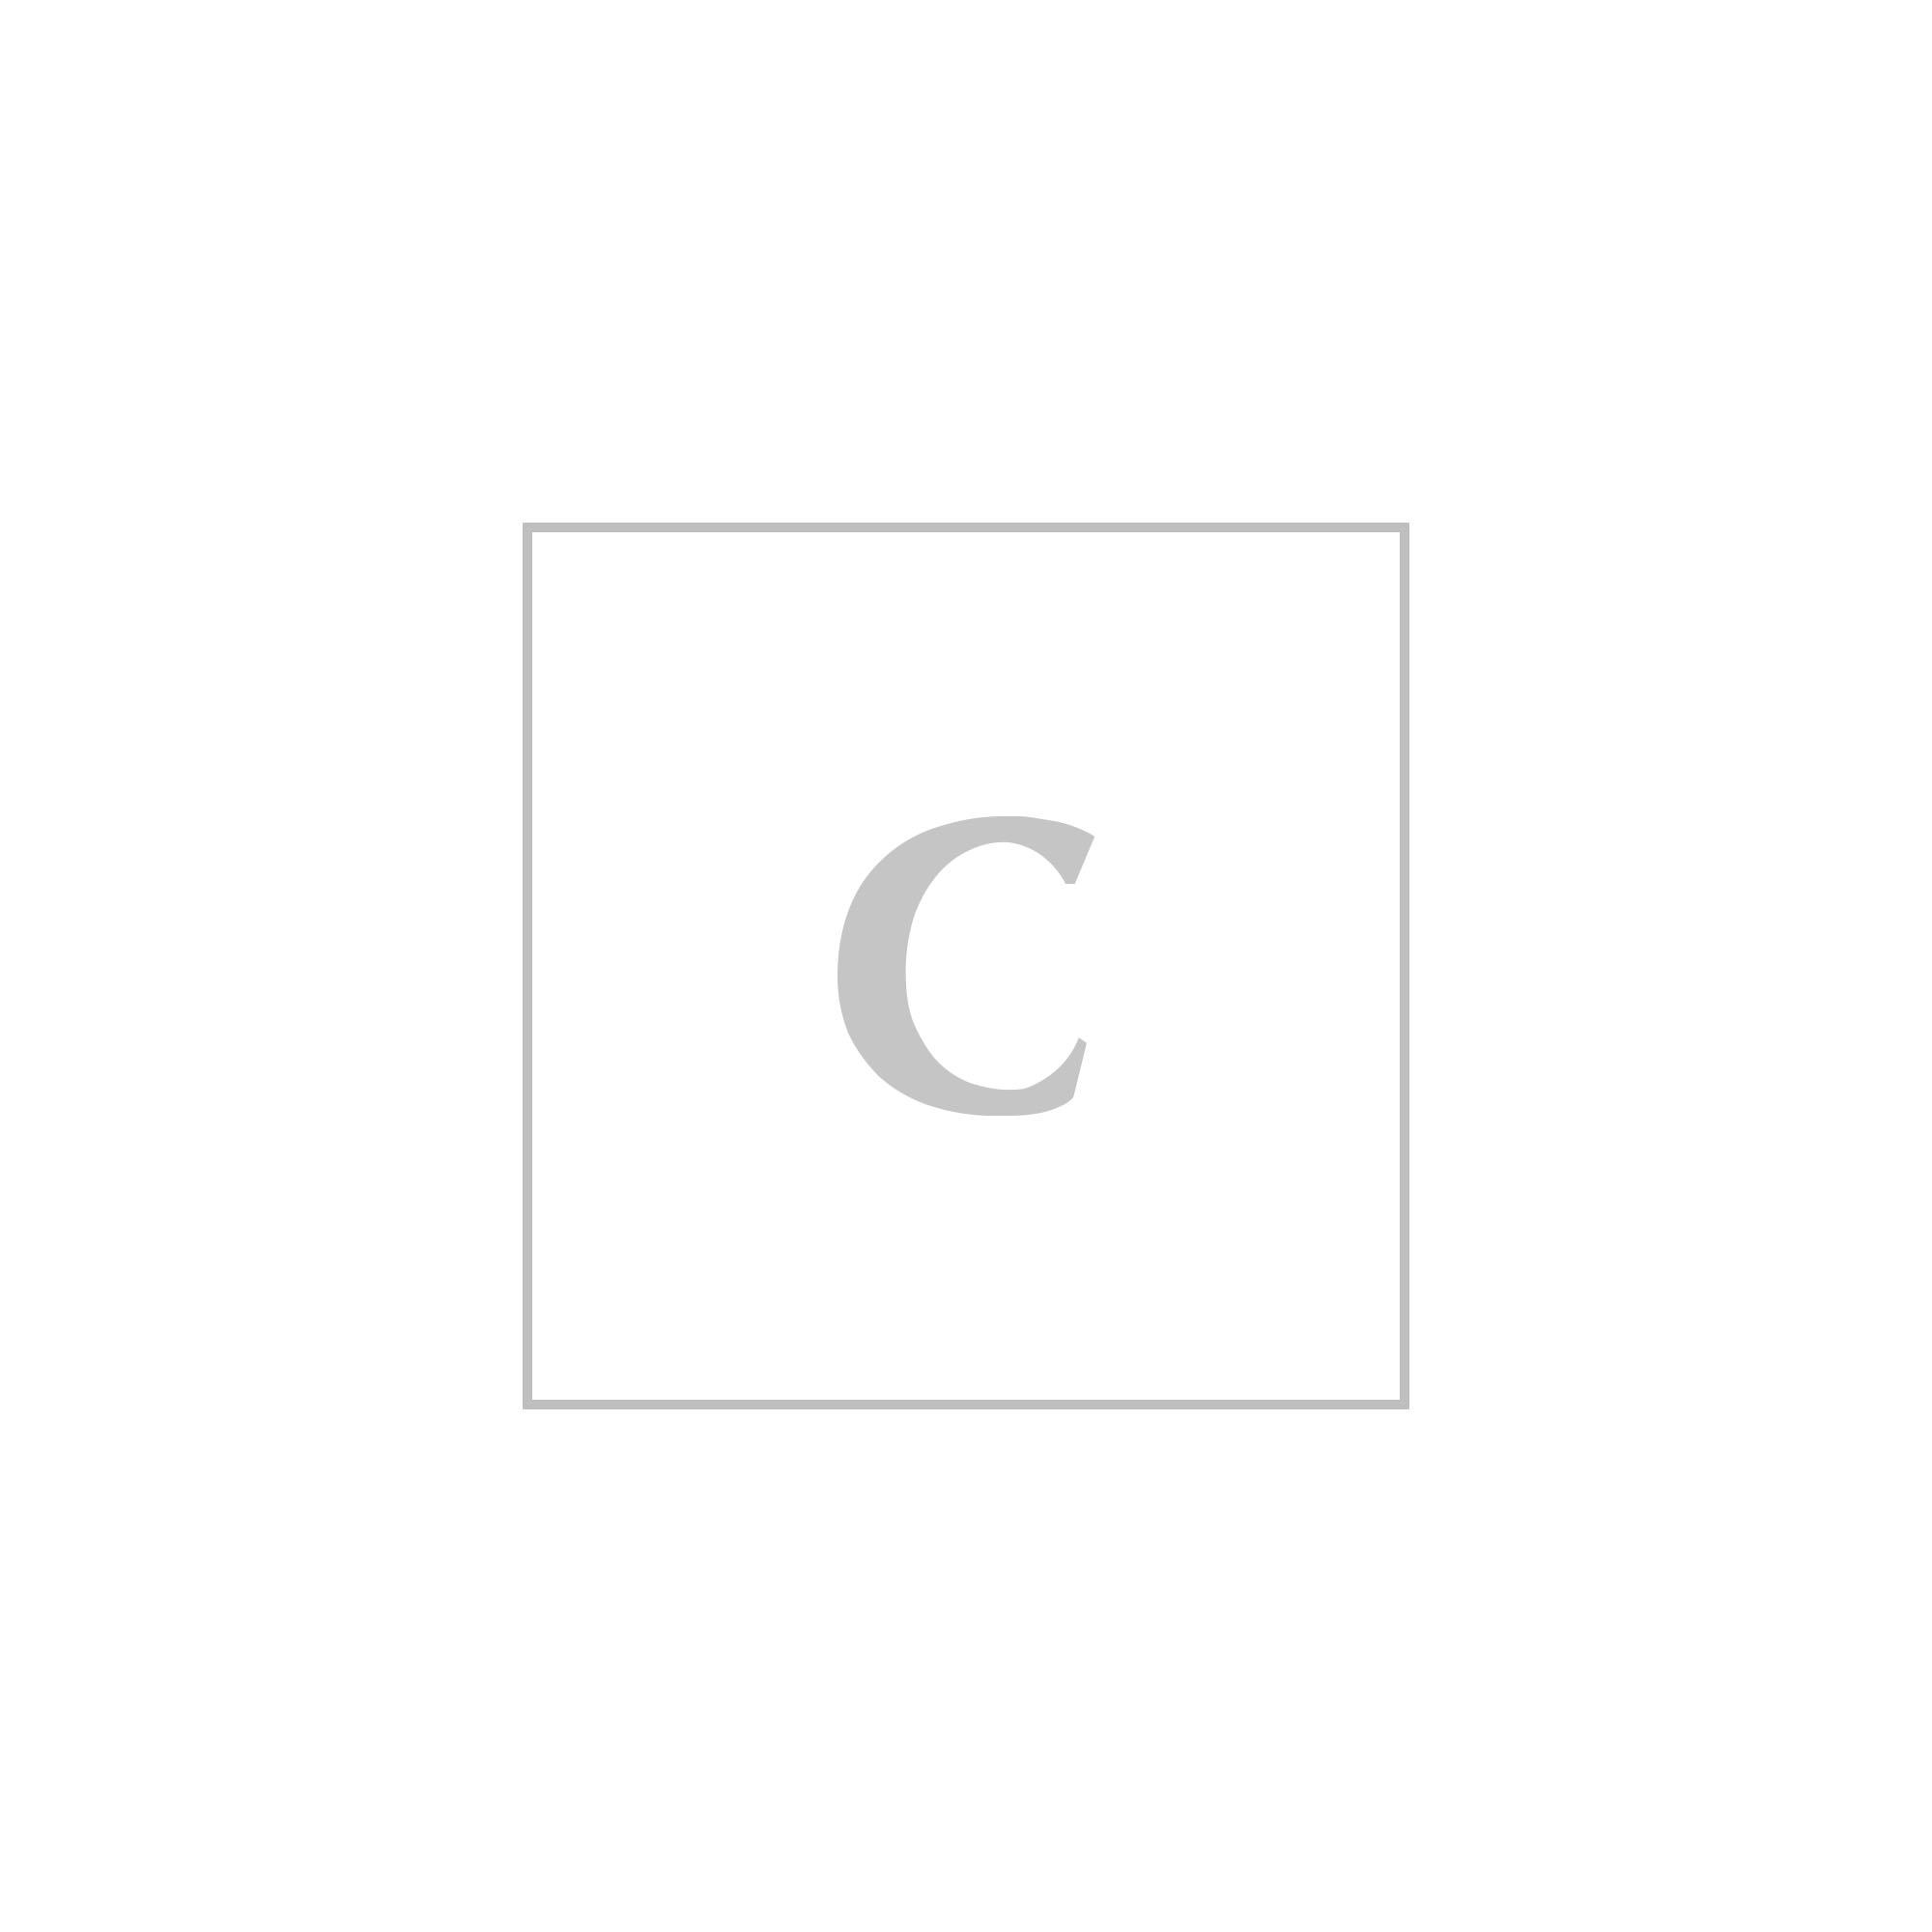 Jackets Quilted Wang Mint Alexander Clear By Adidas Men Originals nTWq1XaqY af6ba4c54cec